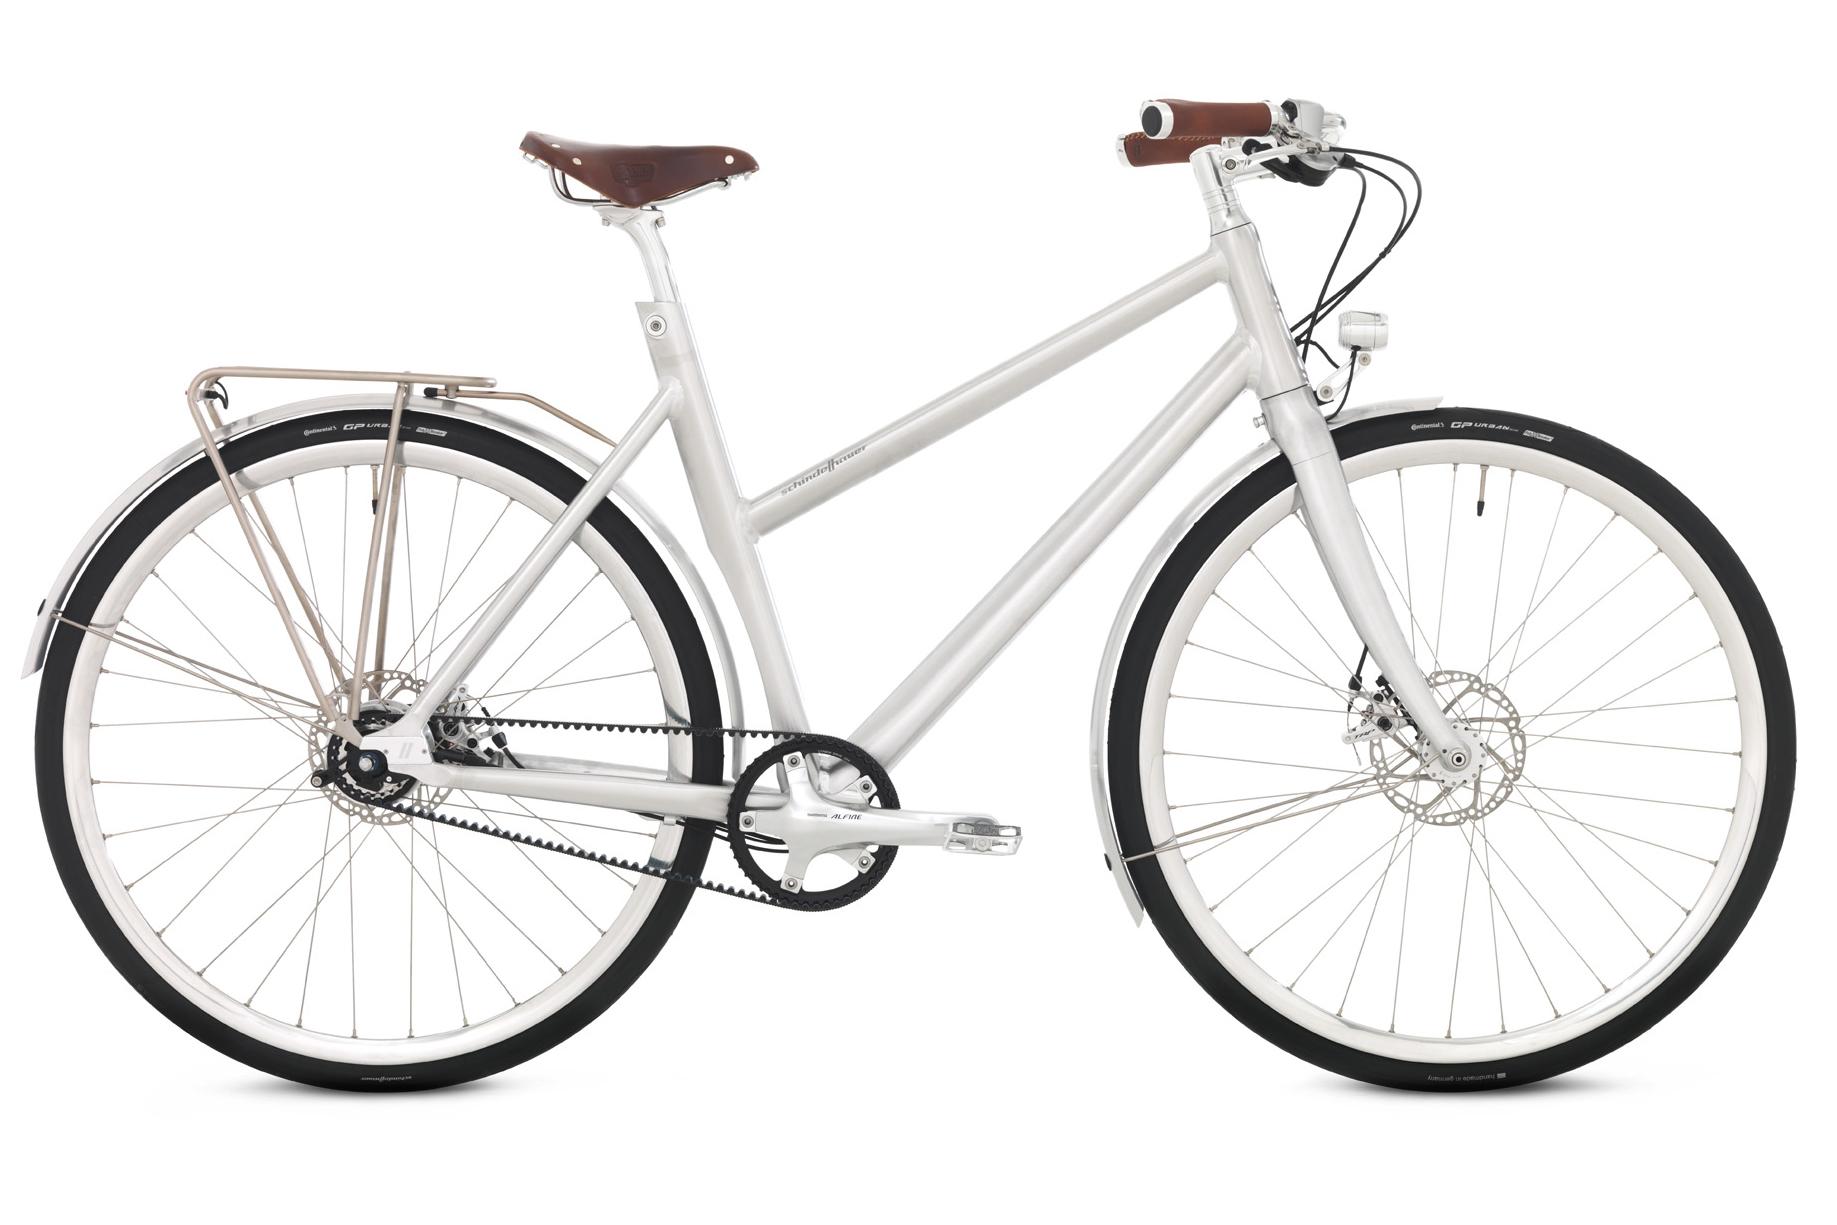 schindelhauer fahrrad frieda 8 gang frauen alu pur beim. Black Bedroom Furniture Sets. Home Design Ideas